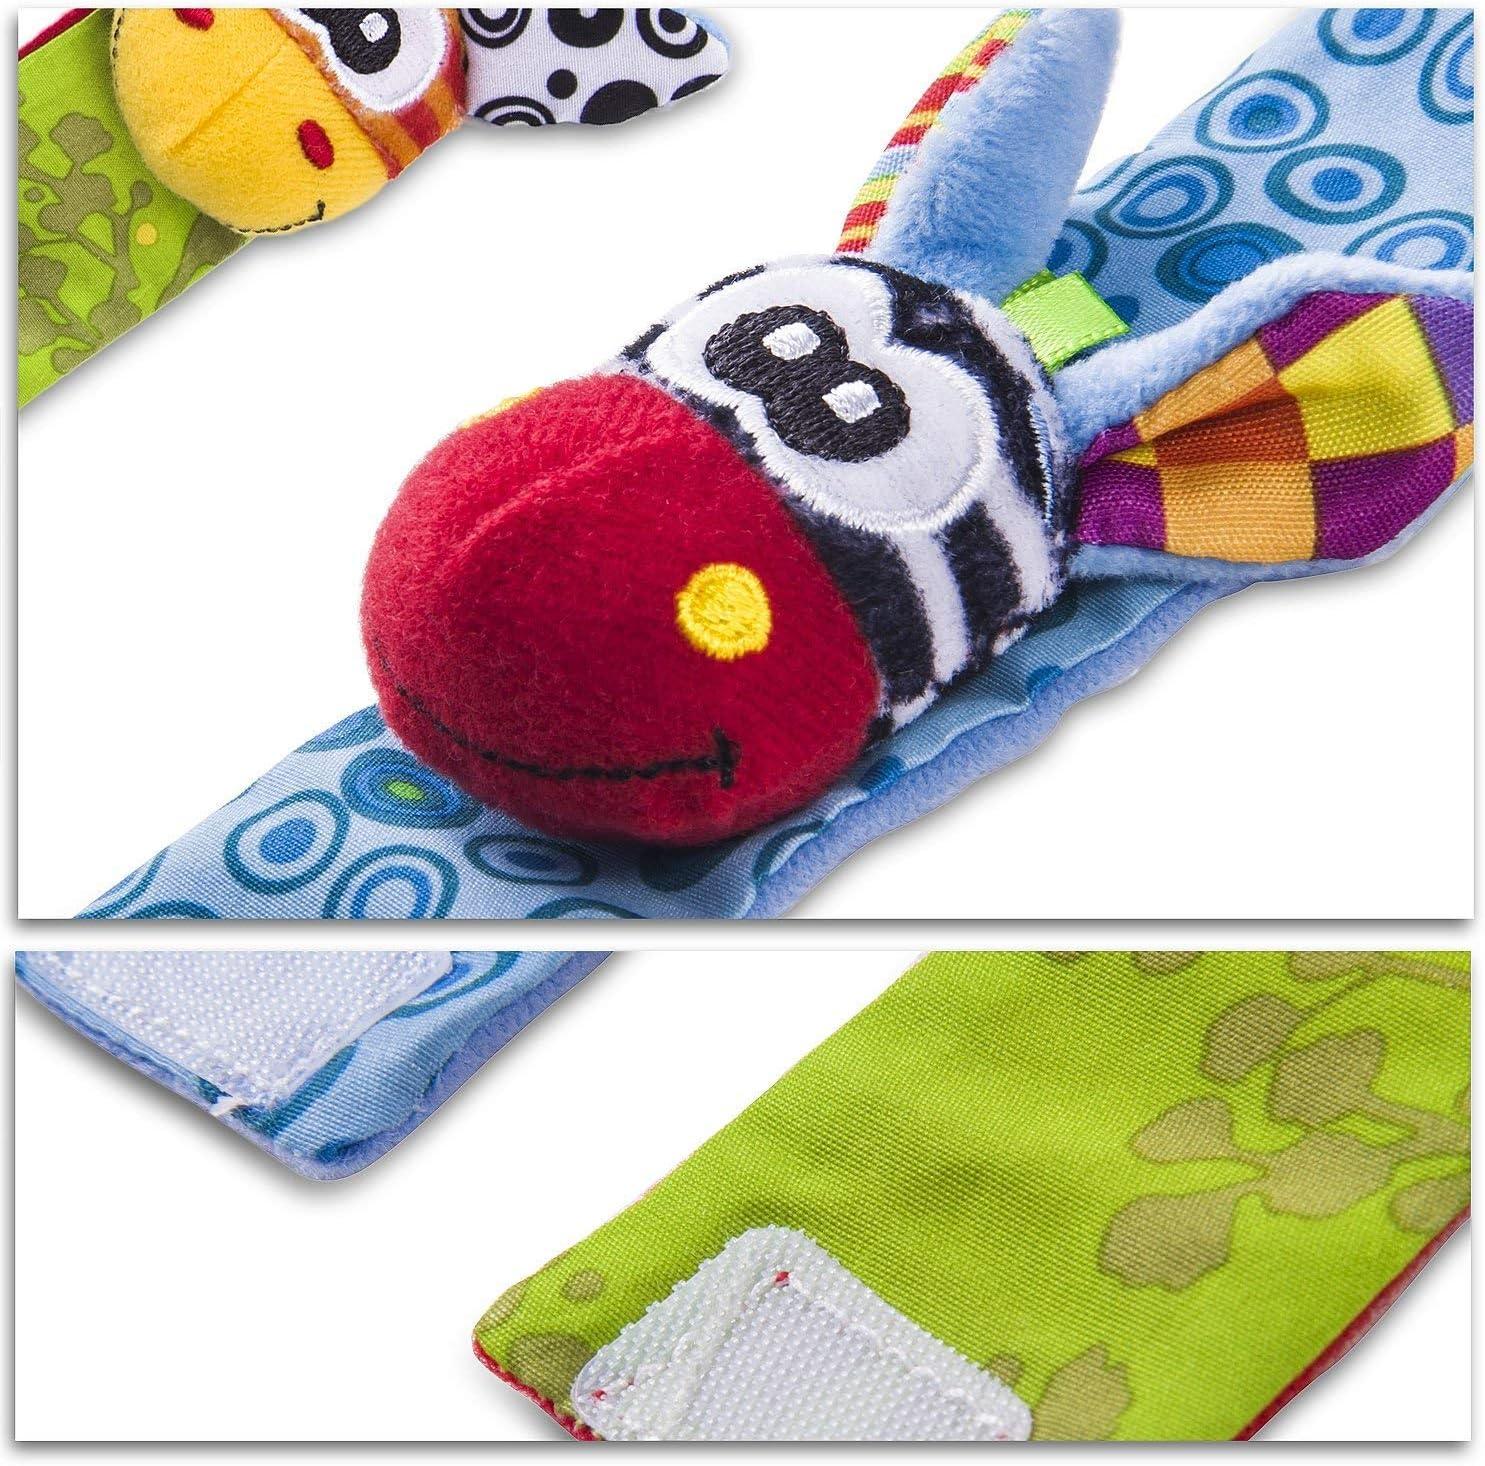 2 pezzi in vita e 2 pezzi Sozzy Socks Baby Rattle Toys Cute Animal Infant 4pcs Soft Wrist Bell Strap Sonagli e Foot Socks Finder Set Sviluppo Soft Toys per bambini from Funky Planet